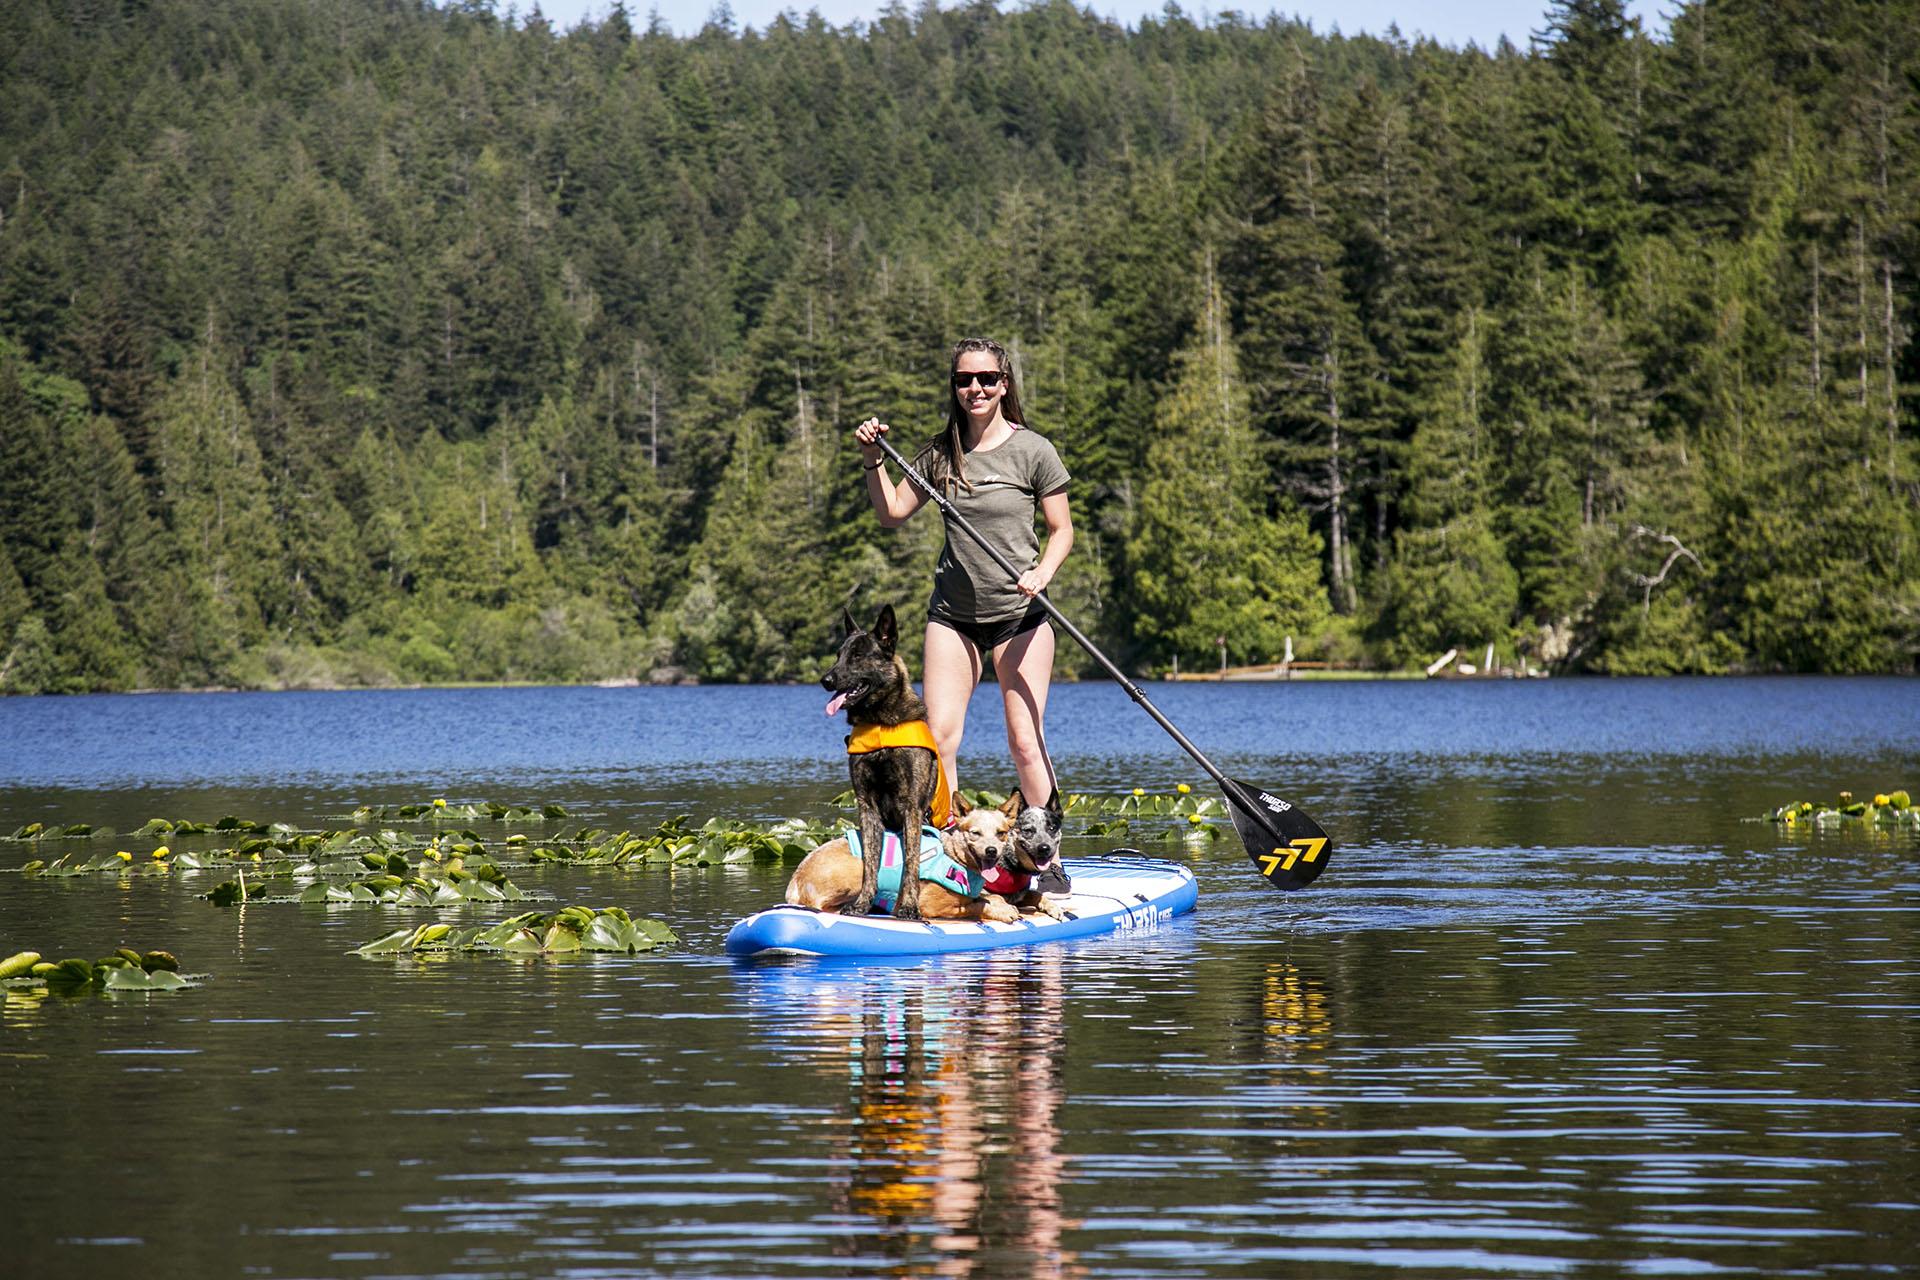 thurso surf ambassador ali paddle board dog sup